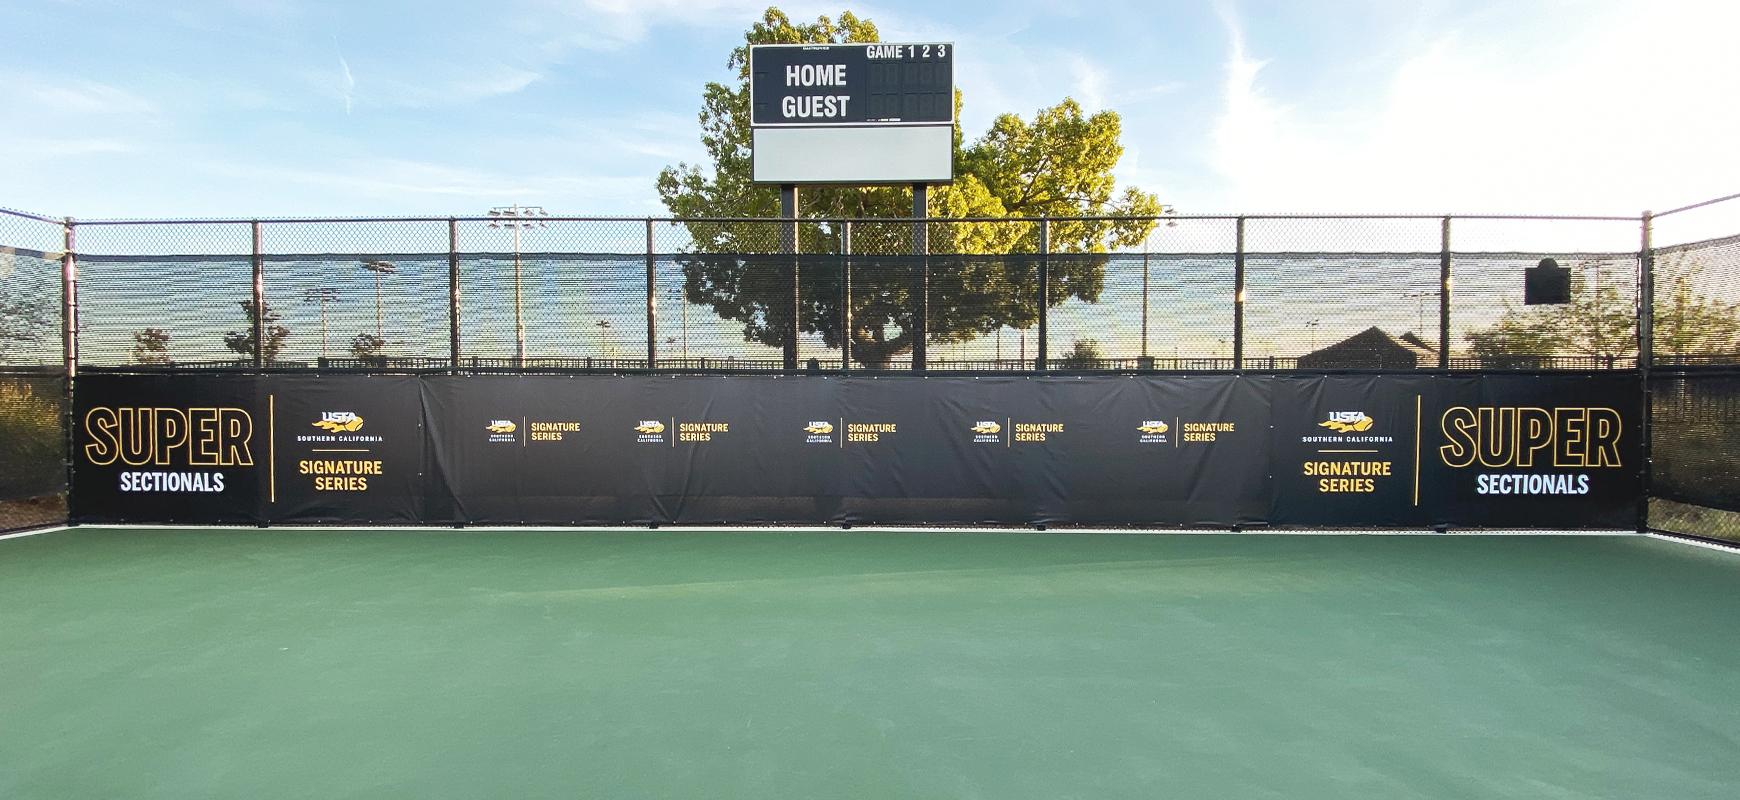 USTA stadium graphics made of vinyl for tennis court branding